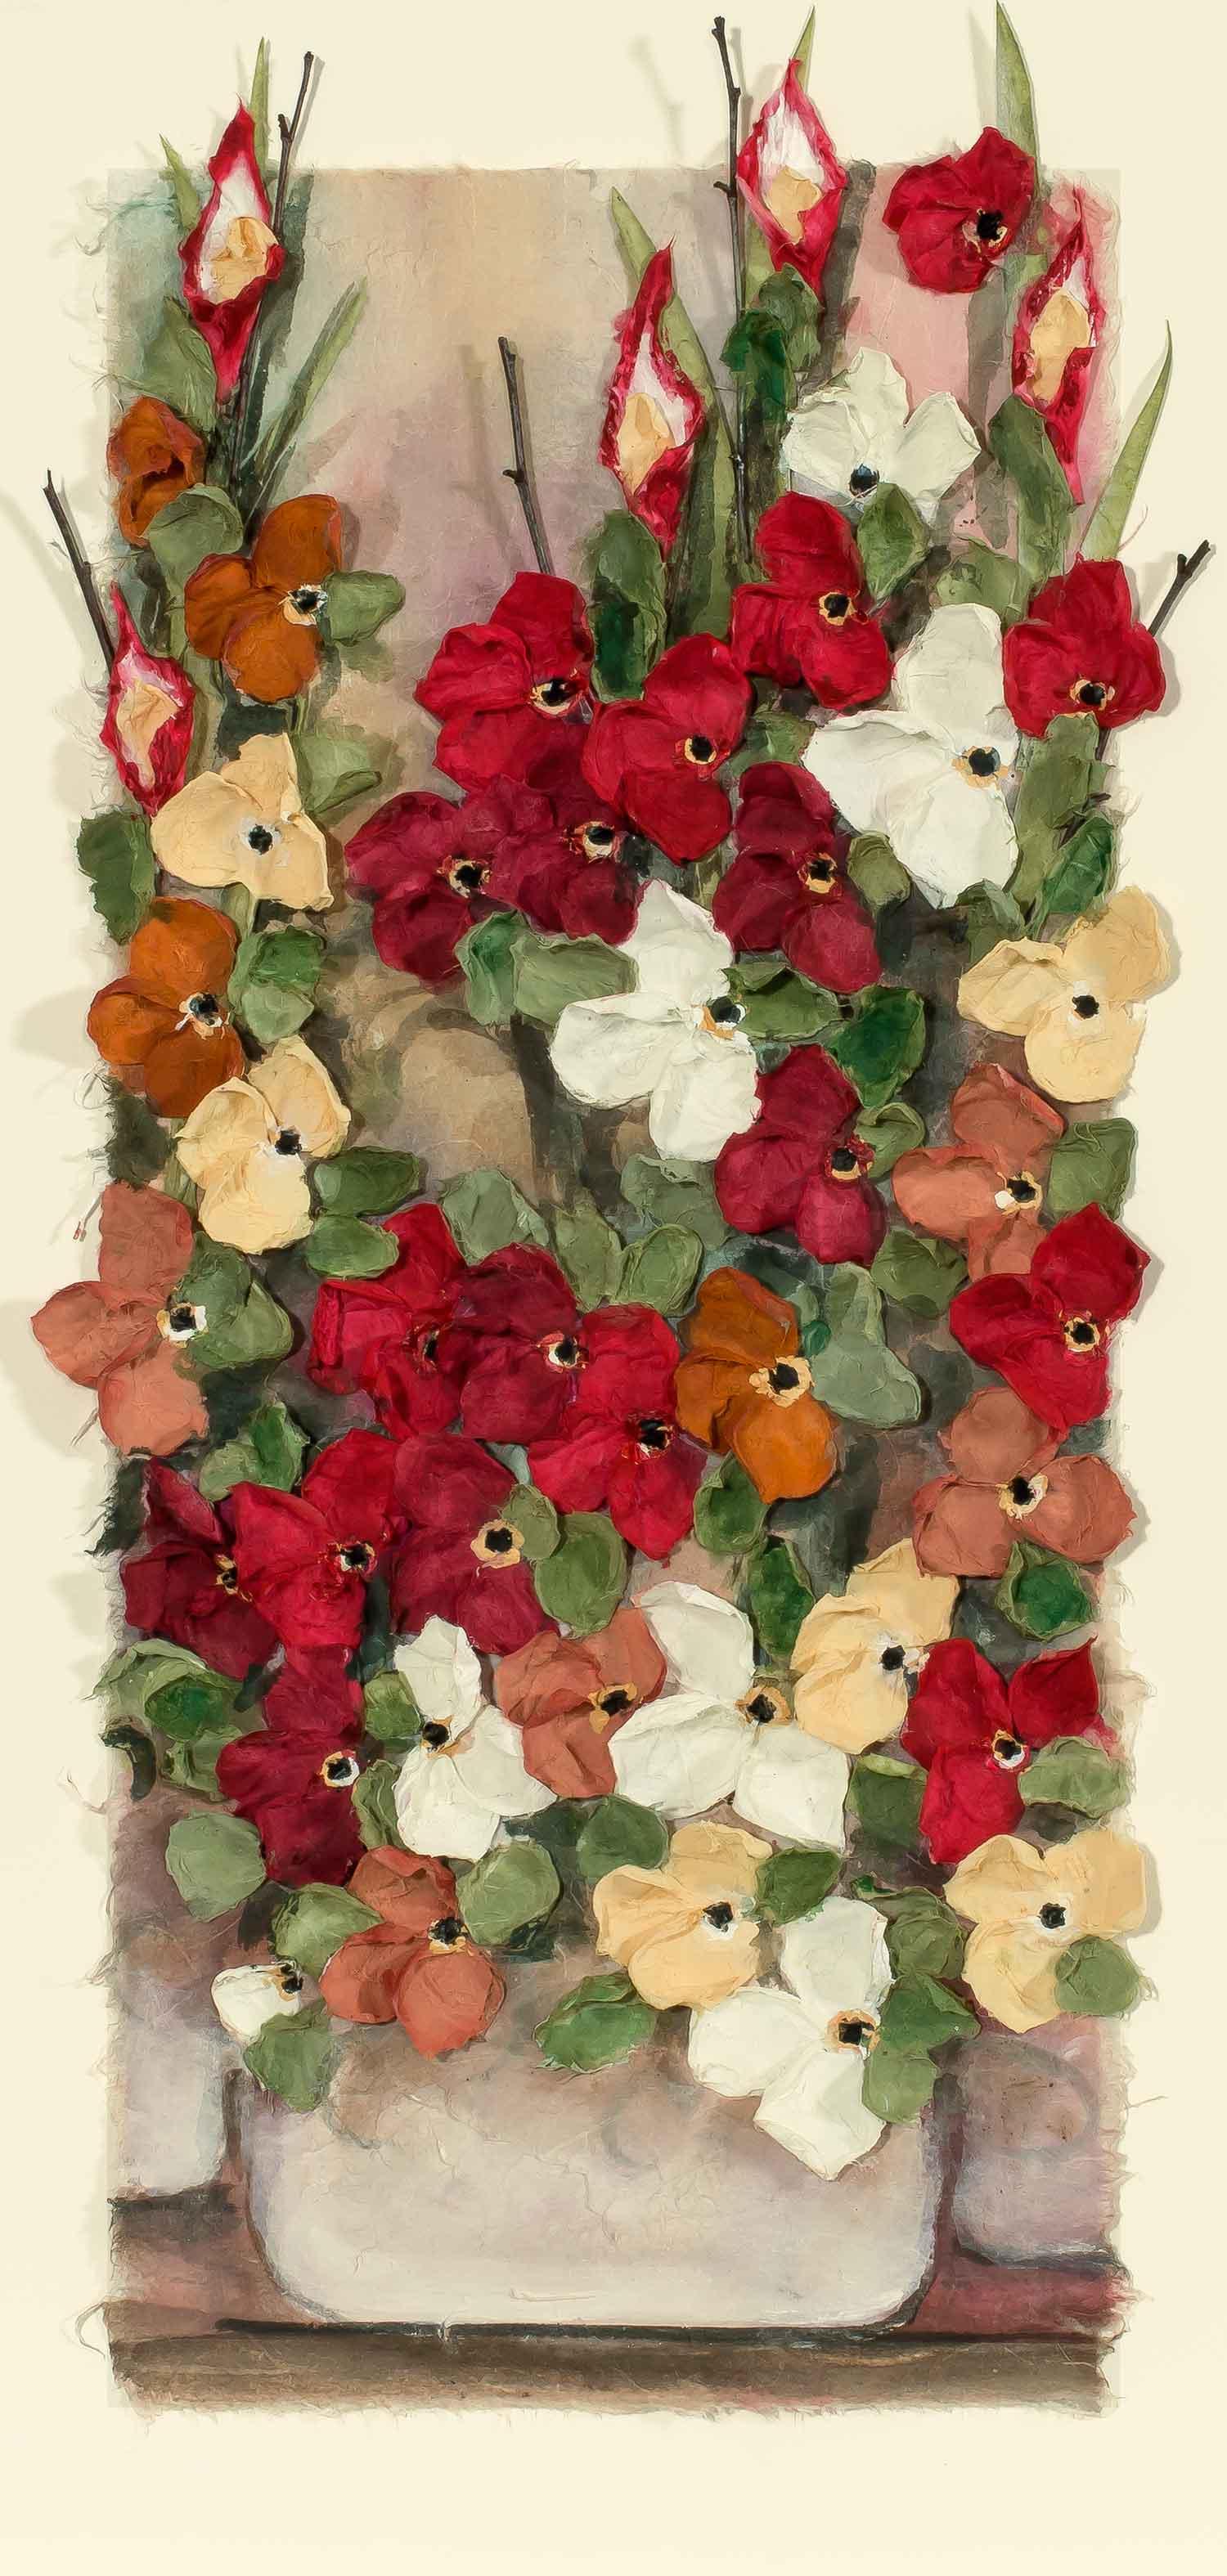 Copy of Mist Floral Red Pot 22x30